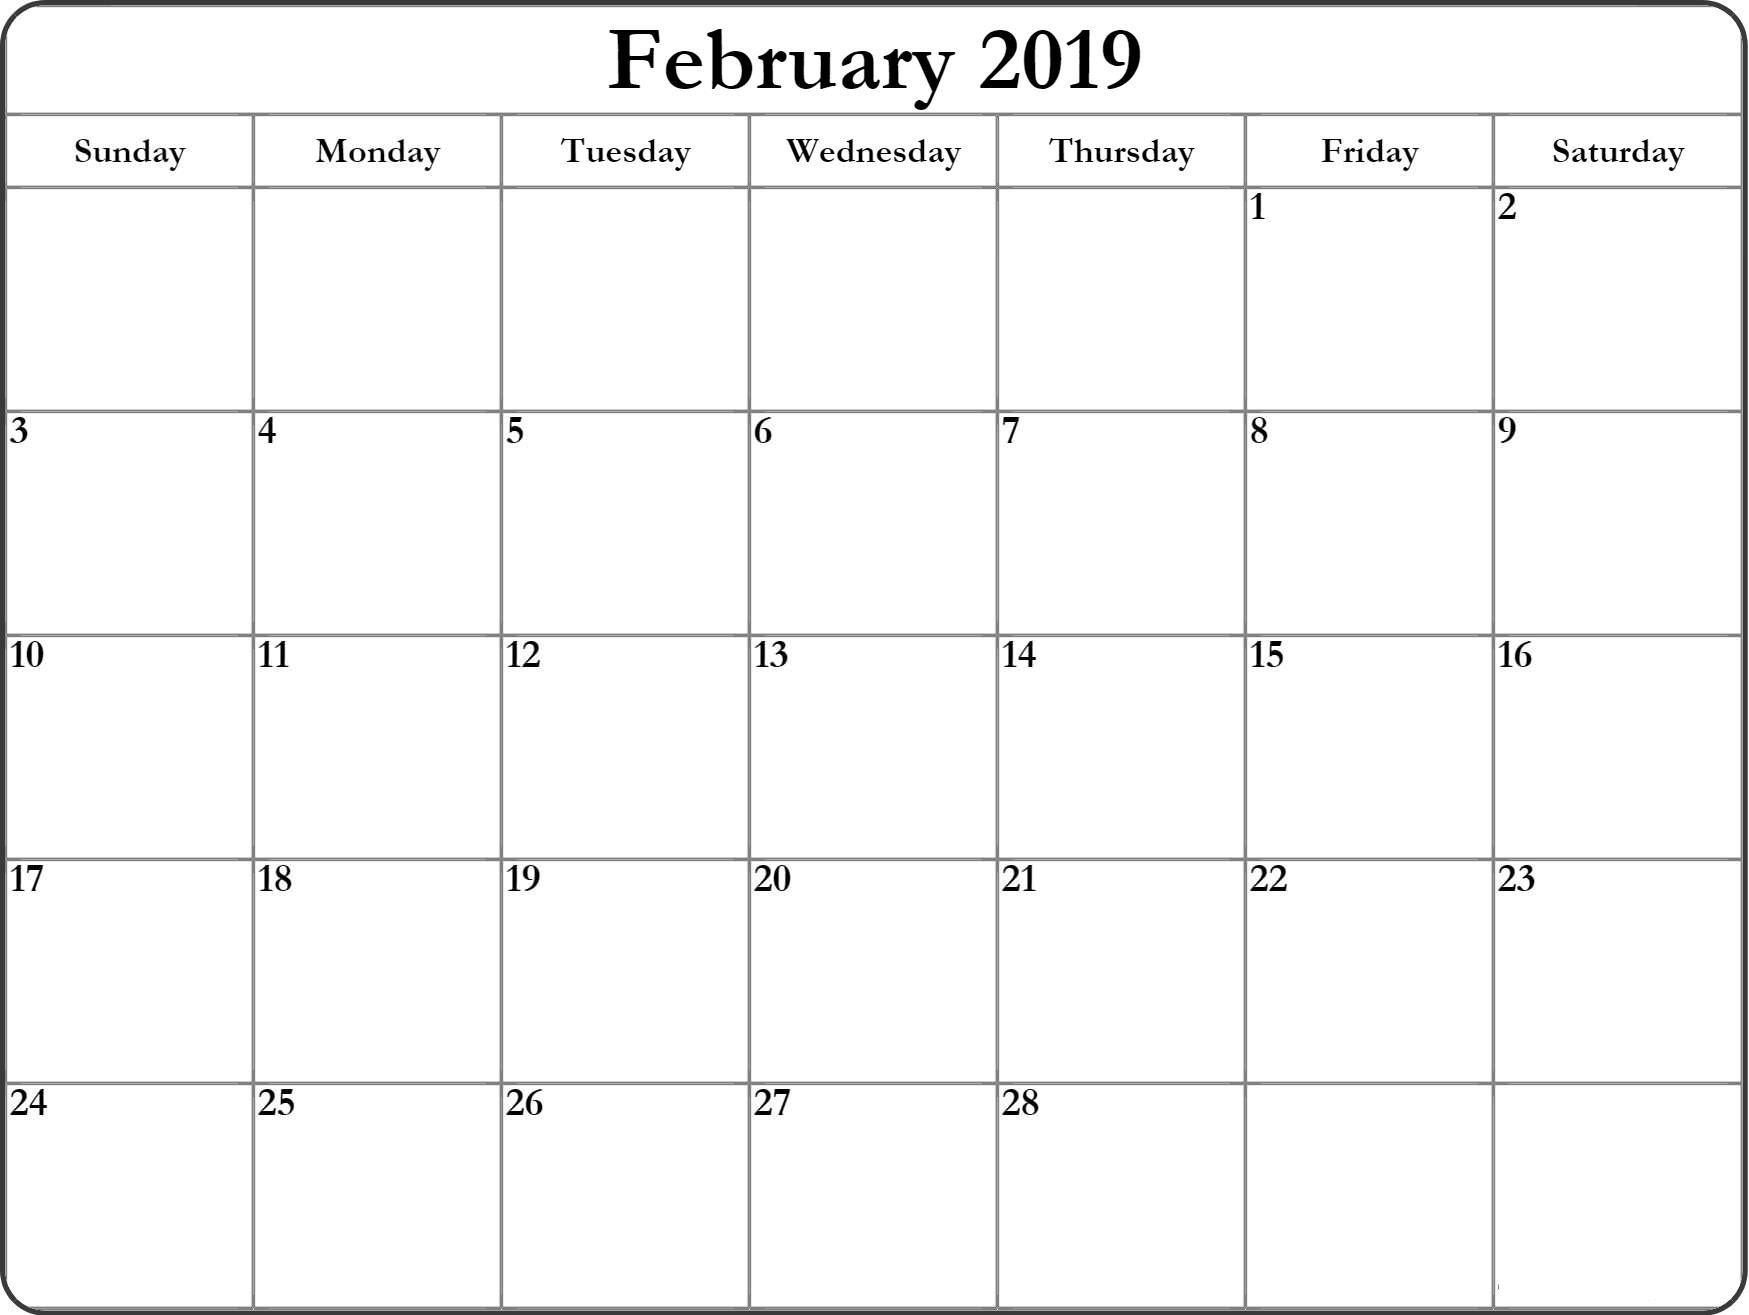 February 2019 Large Calendar February Calendar 2019 Large | February Calendar 2019 Manage Work